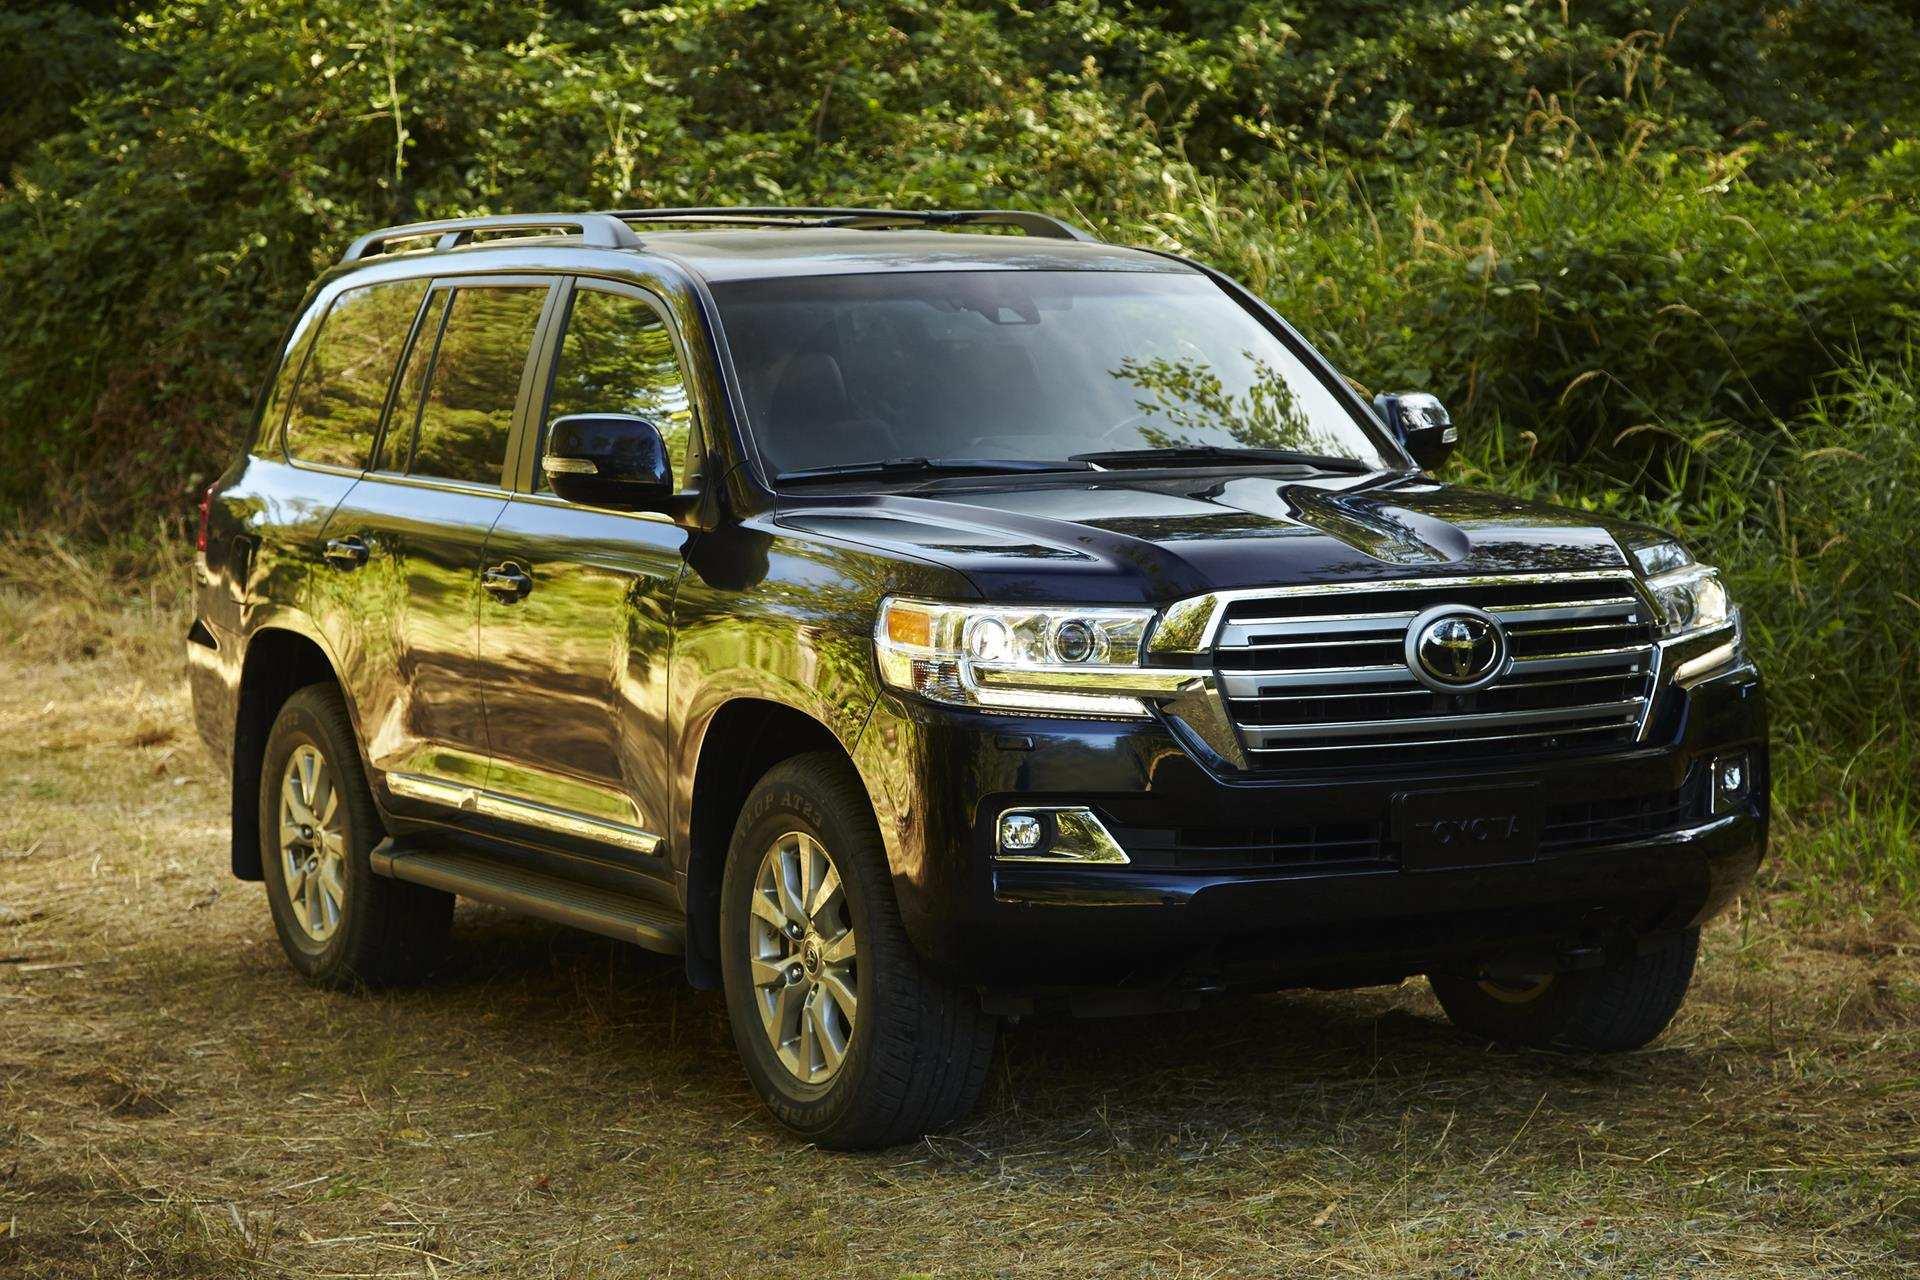 48 Concept of Toyota Land Cruiser Prado 2020 Price and Review for Toyota Land Cruiser Prado 2020